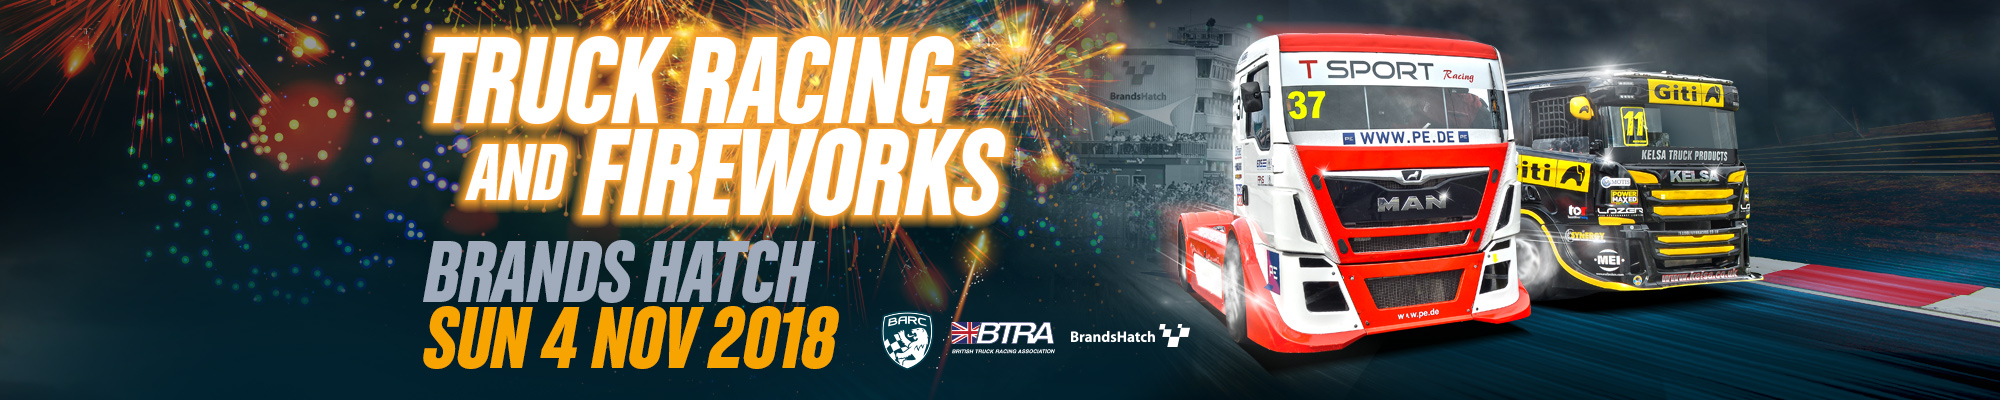 British Truck Racing Championship & Fireworks